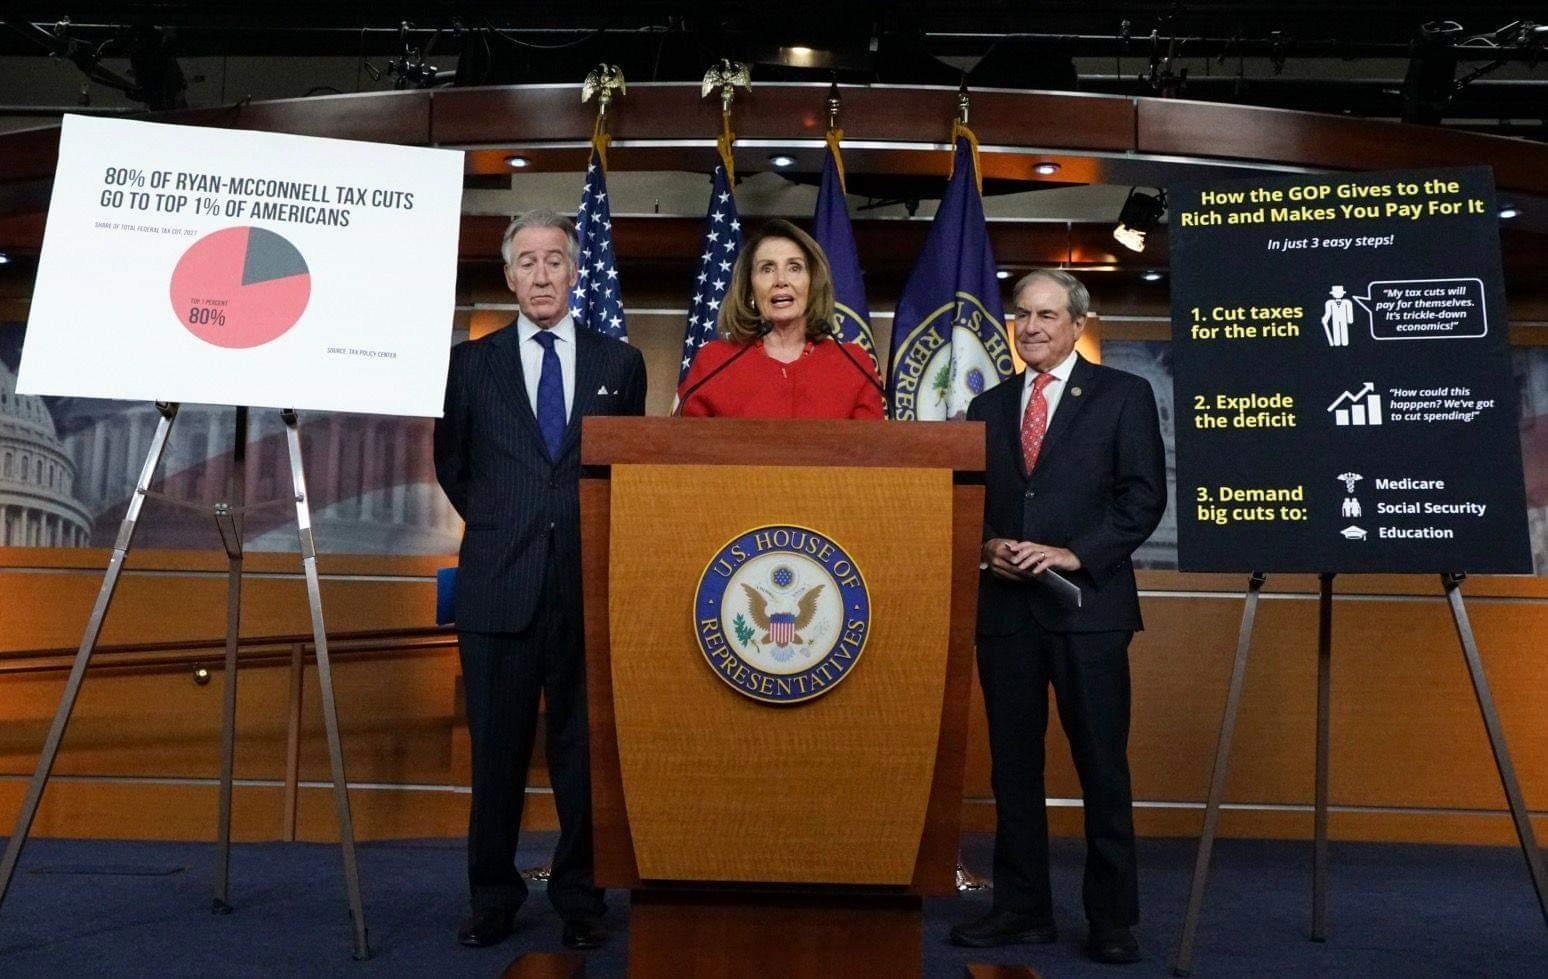 Pelosi Slowly Silencing Speakership Opponents - California Globe